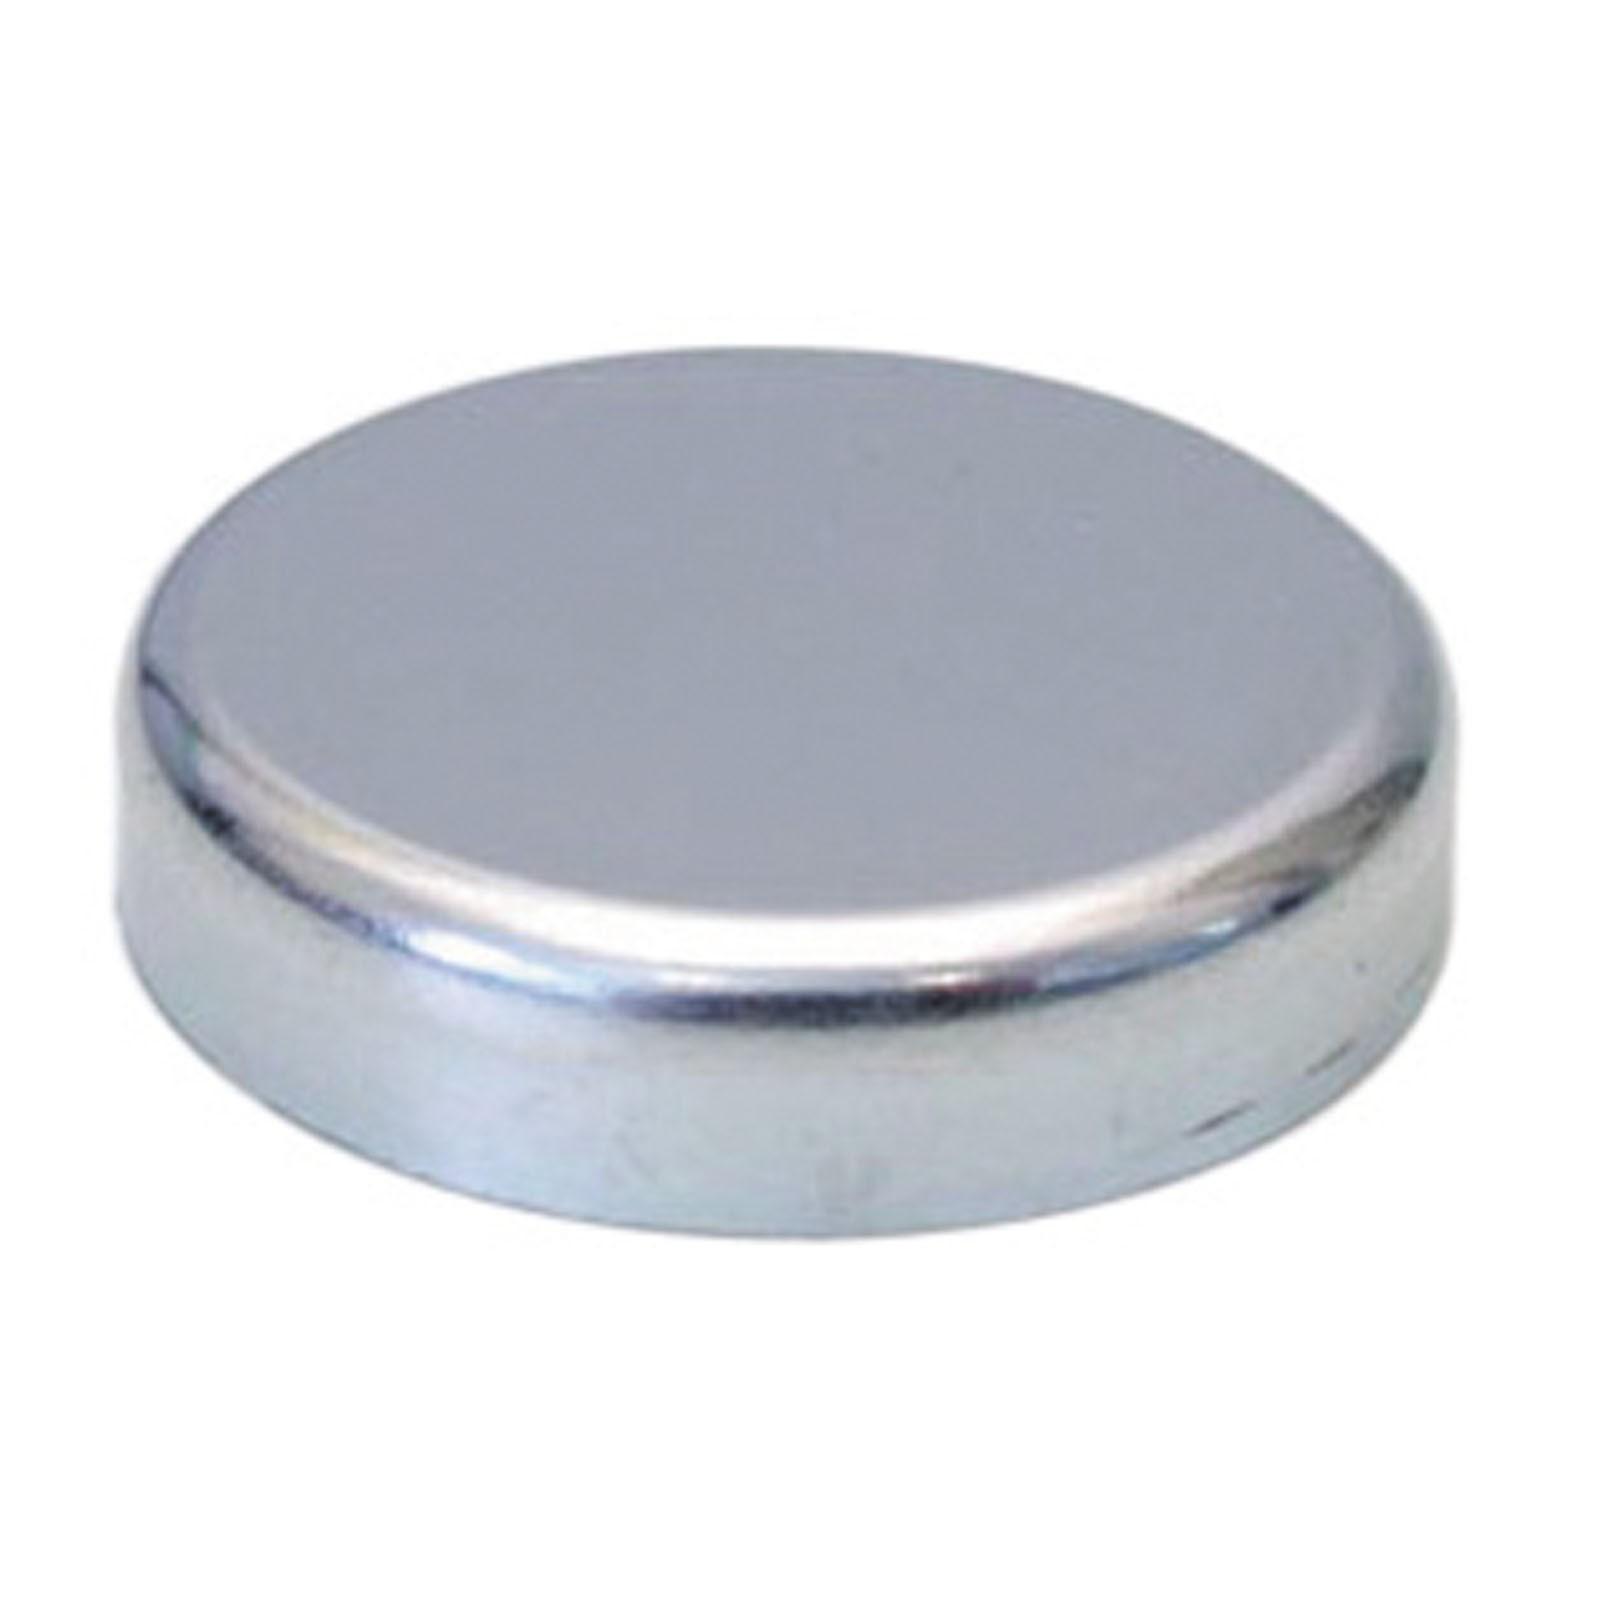 schweisser-king.de: Flachgreifer Magnet Magnetfuß Oxit Hartferrit div. Größen